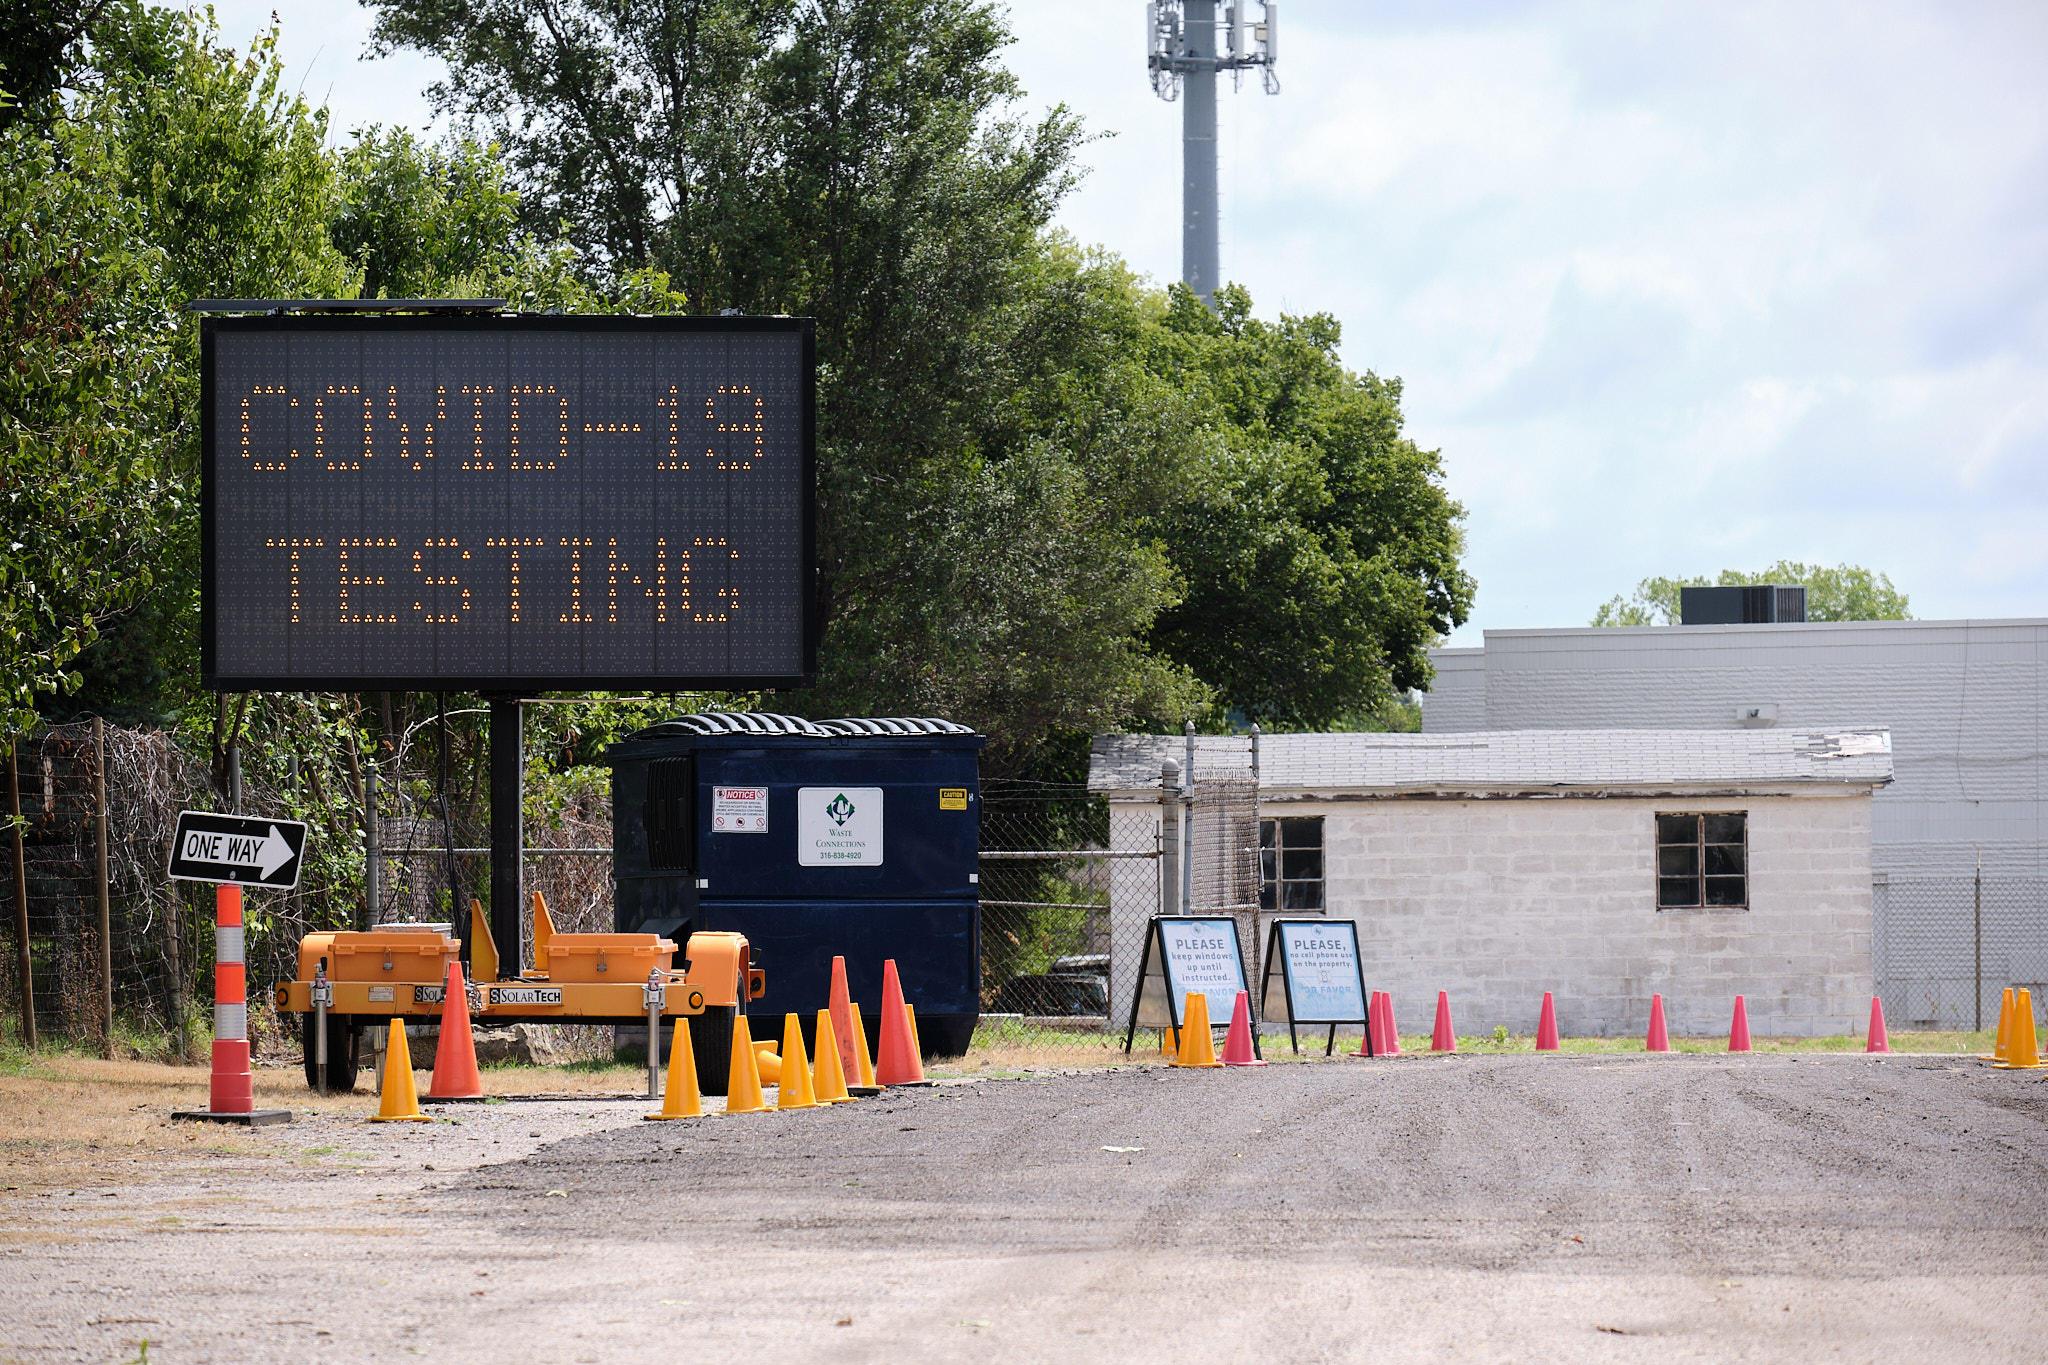 A coronavirus testing site in Sedgwick County. (Photo by Brian Grimmett, Kansas News Service)